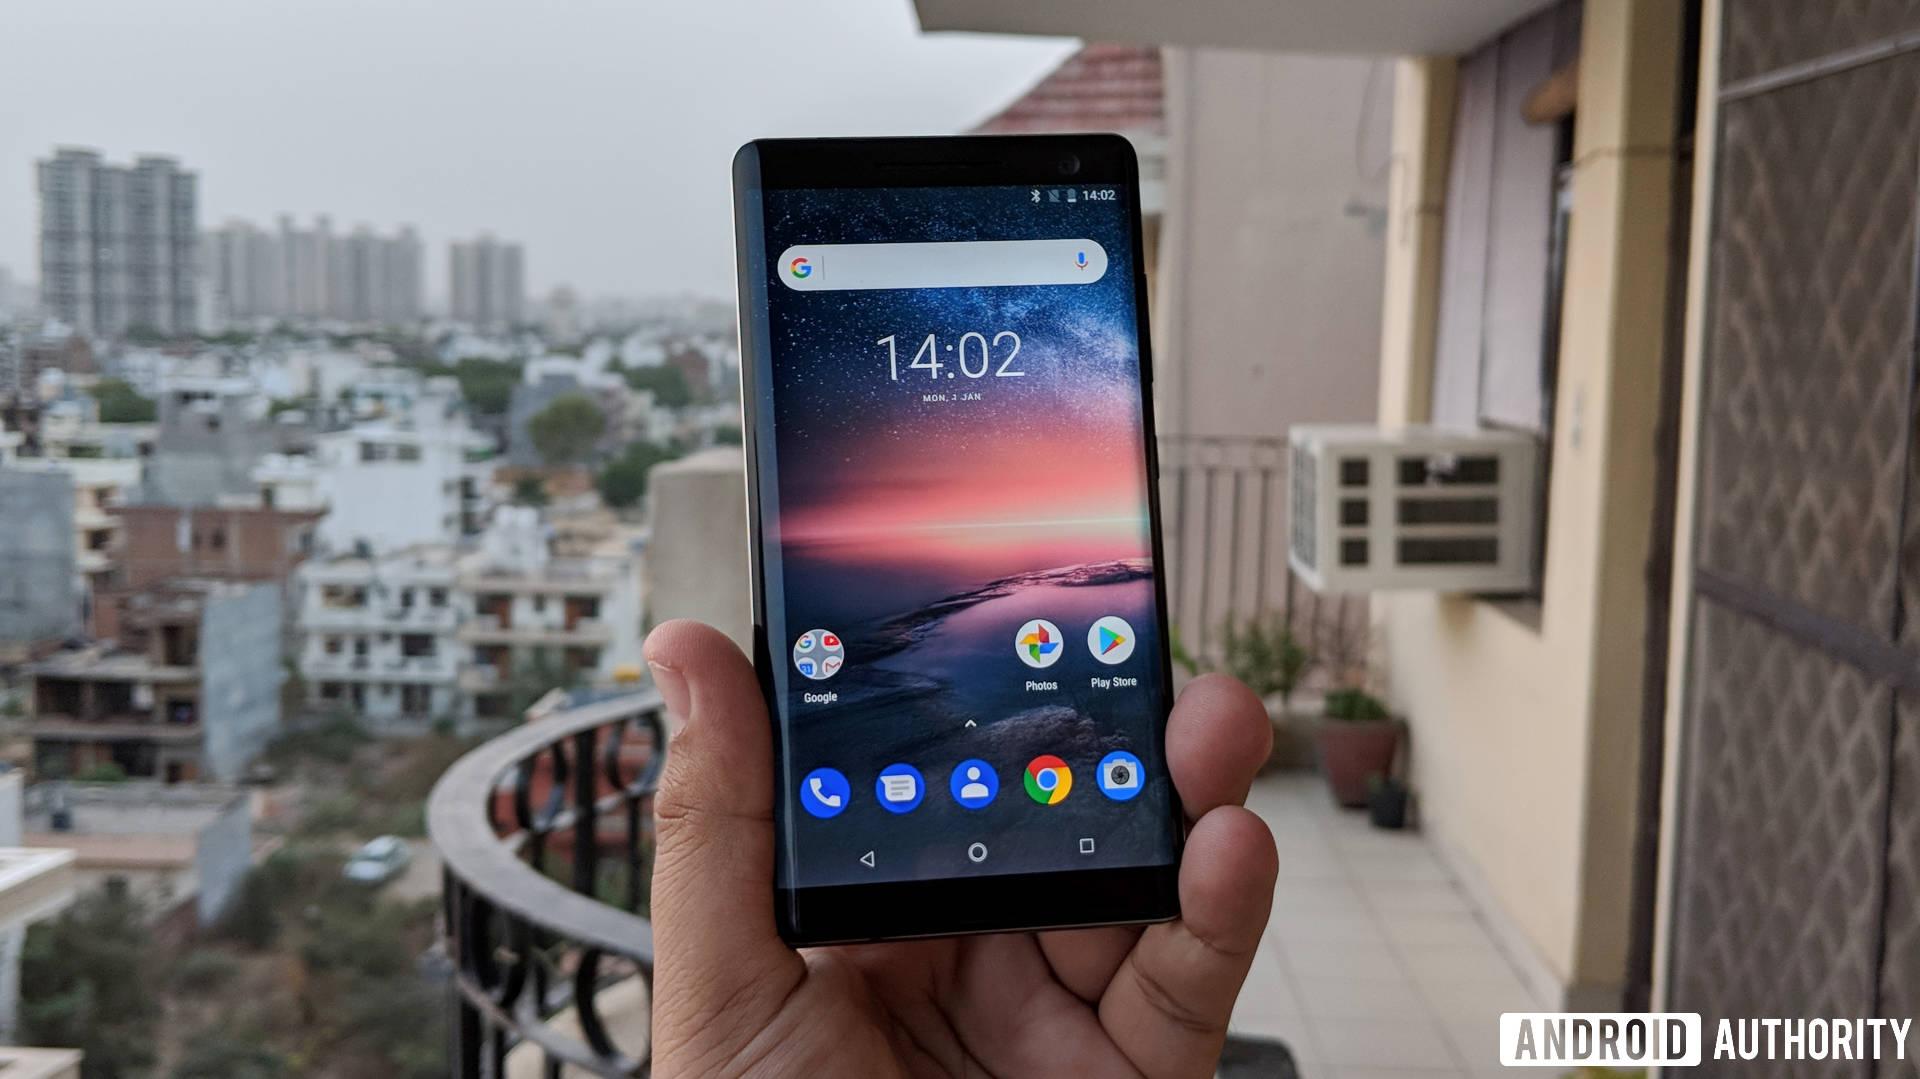 Nokia 8 Sirocco held in hand